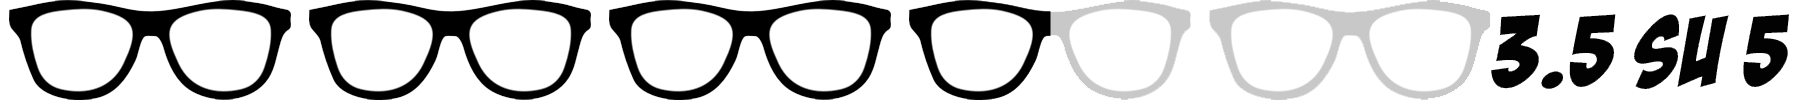 occhiali nerd 3.5 su 5